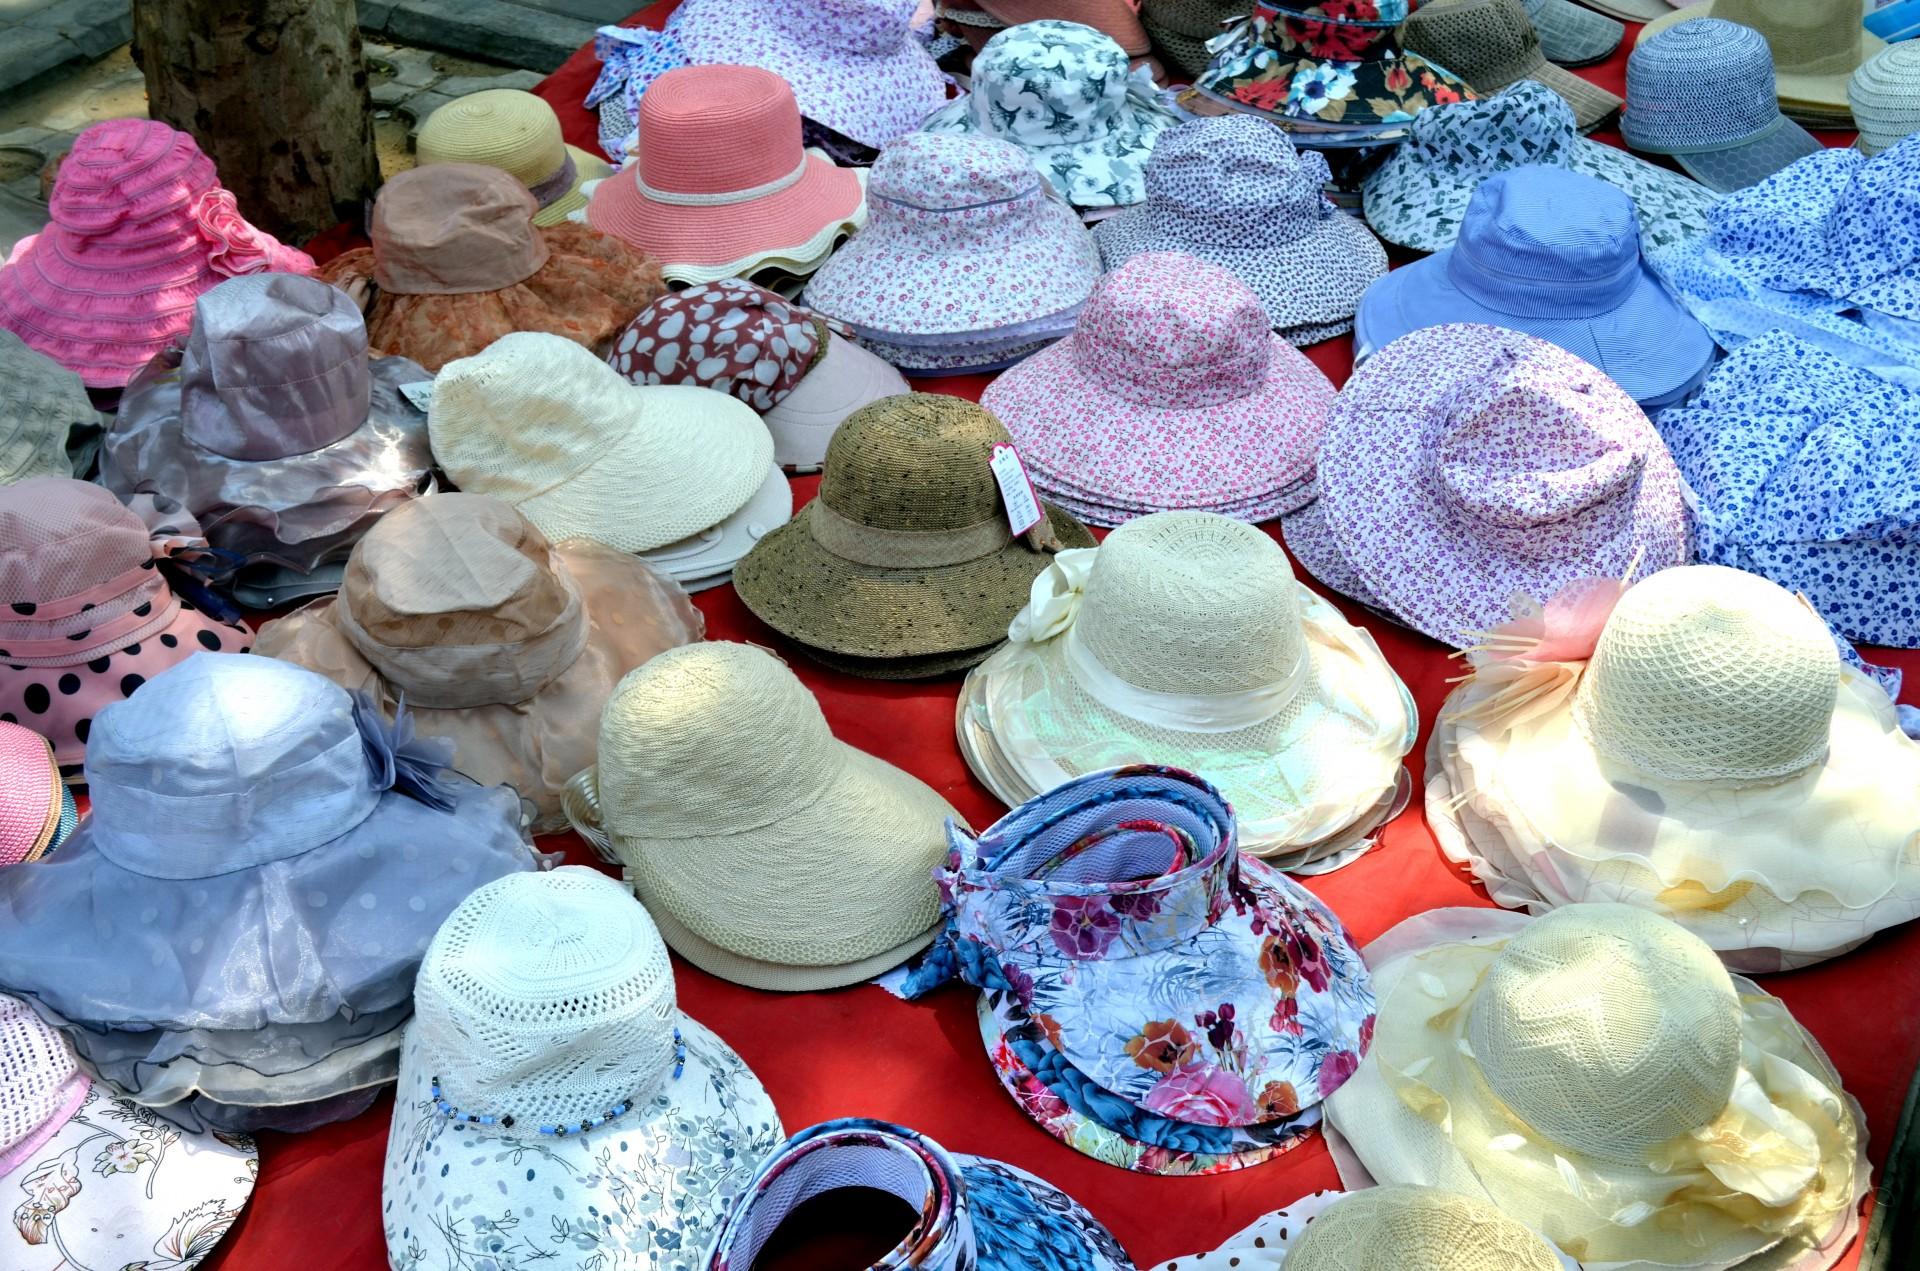 Hats, Summer, Heat Relief Safety, Straw Hats